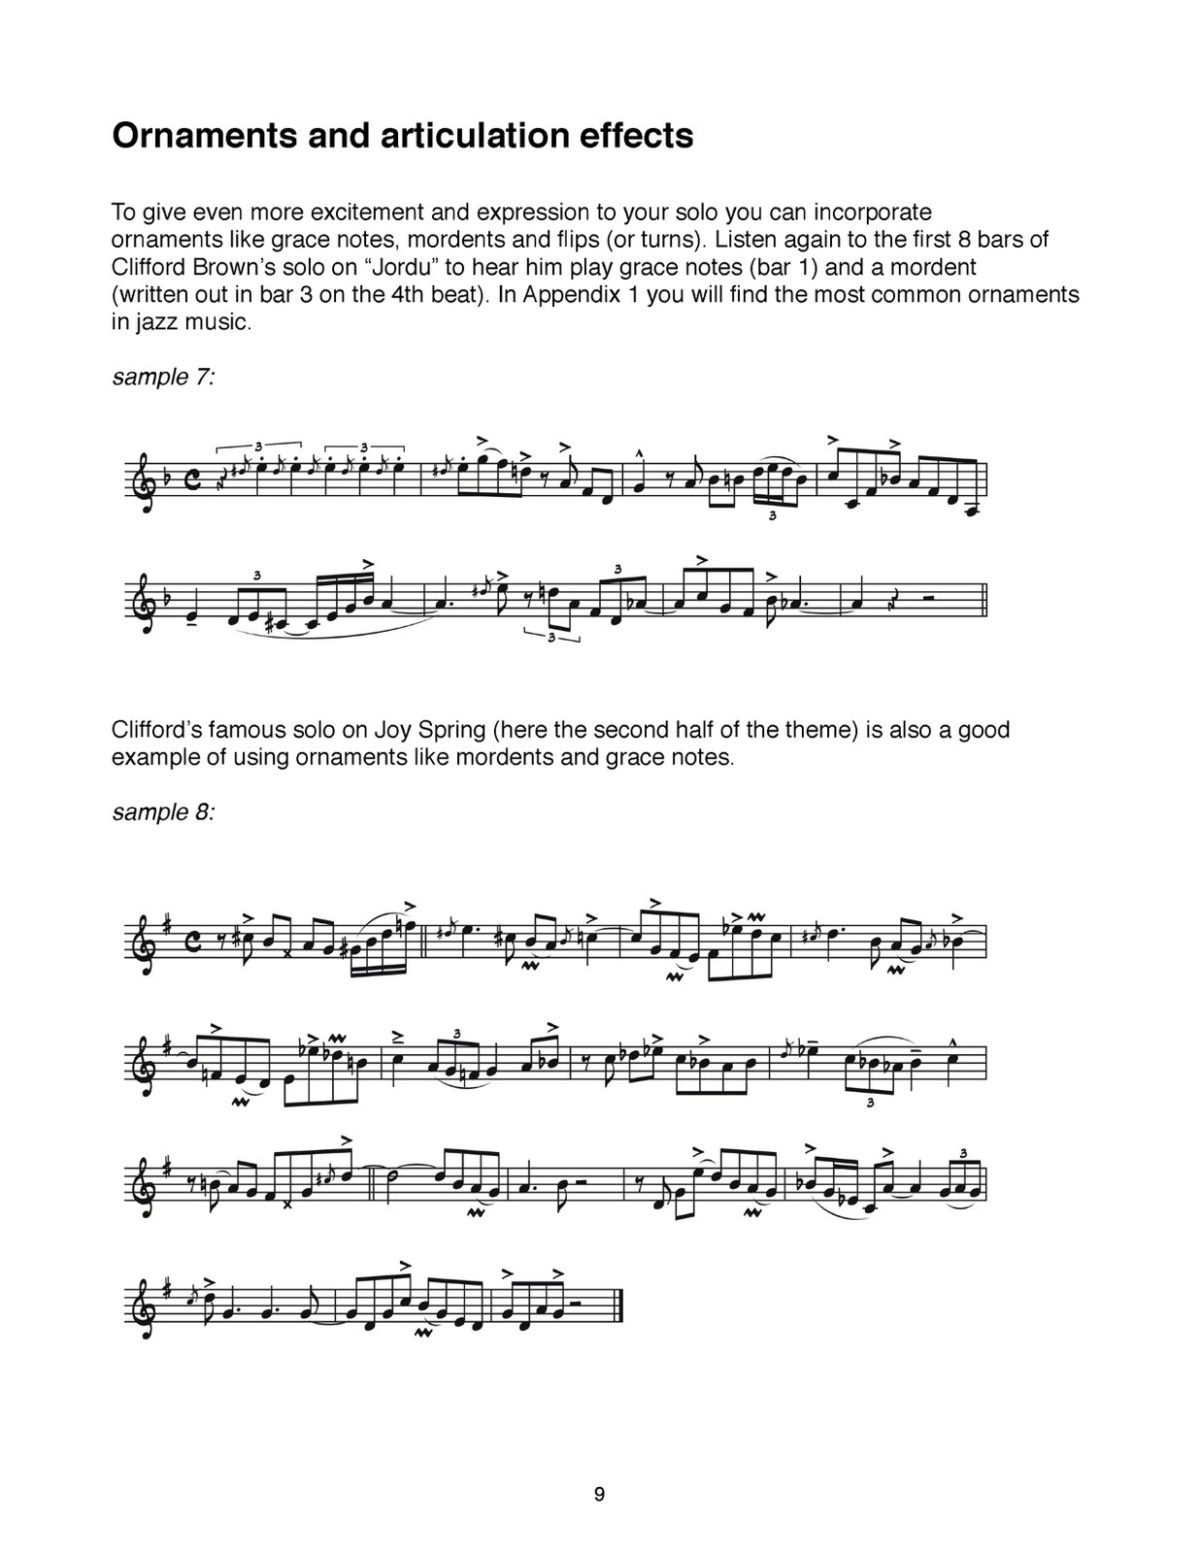 Veldkamp, The Jazz Articulation Big Book-p011